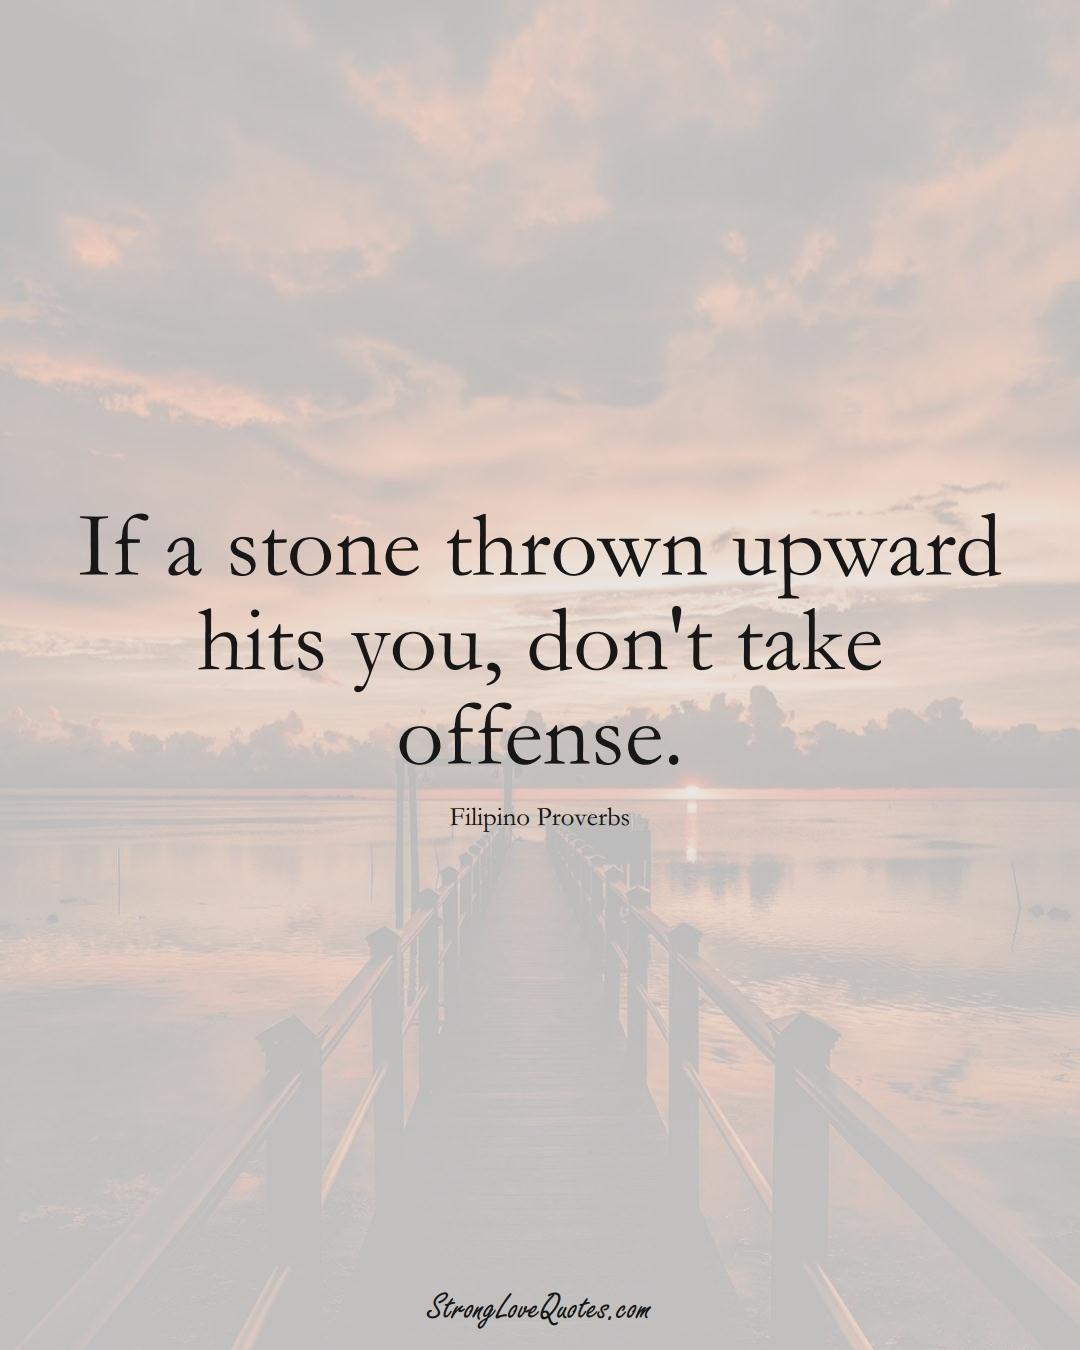 If a stone thrown upward hits you, don't take offense. (Filipino Sayings);  #AsianSayings